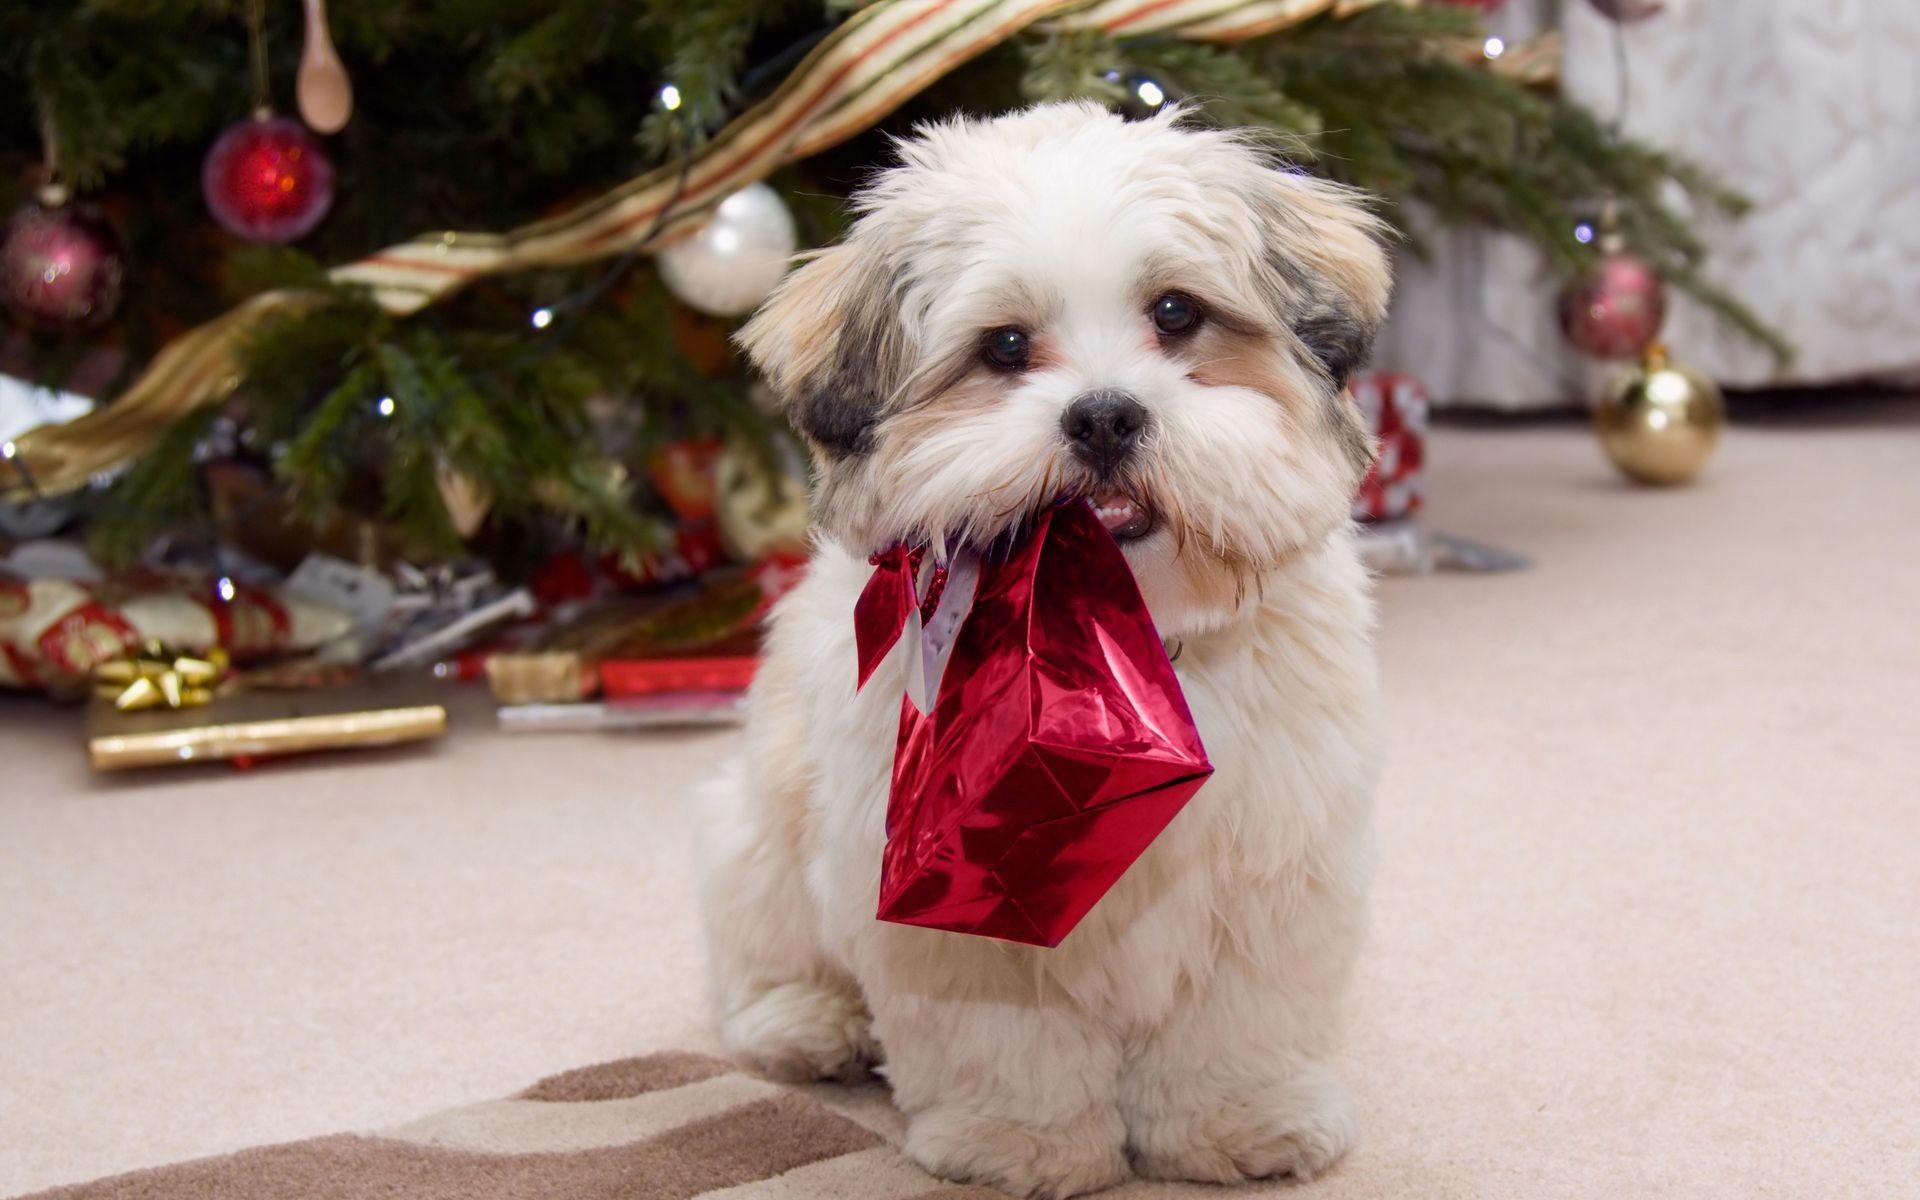 Canon papercraft: animals paper model shih tzu dog free download.